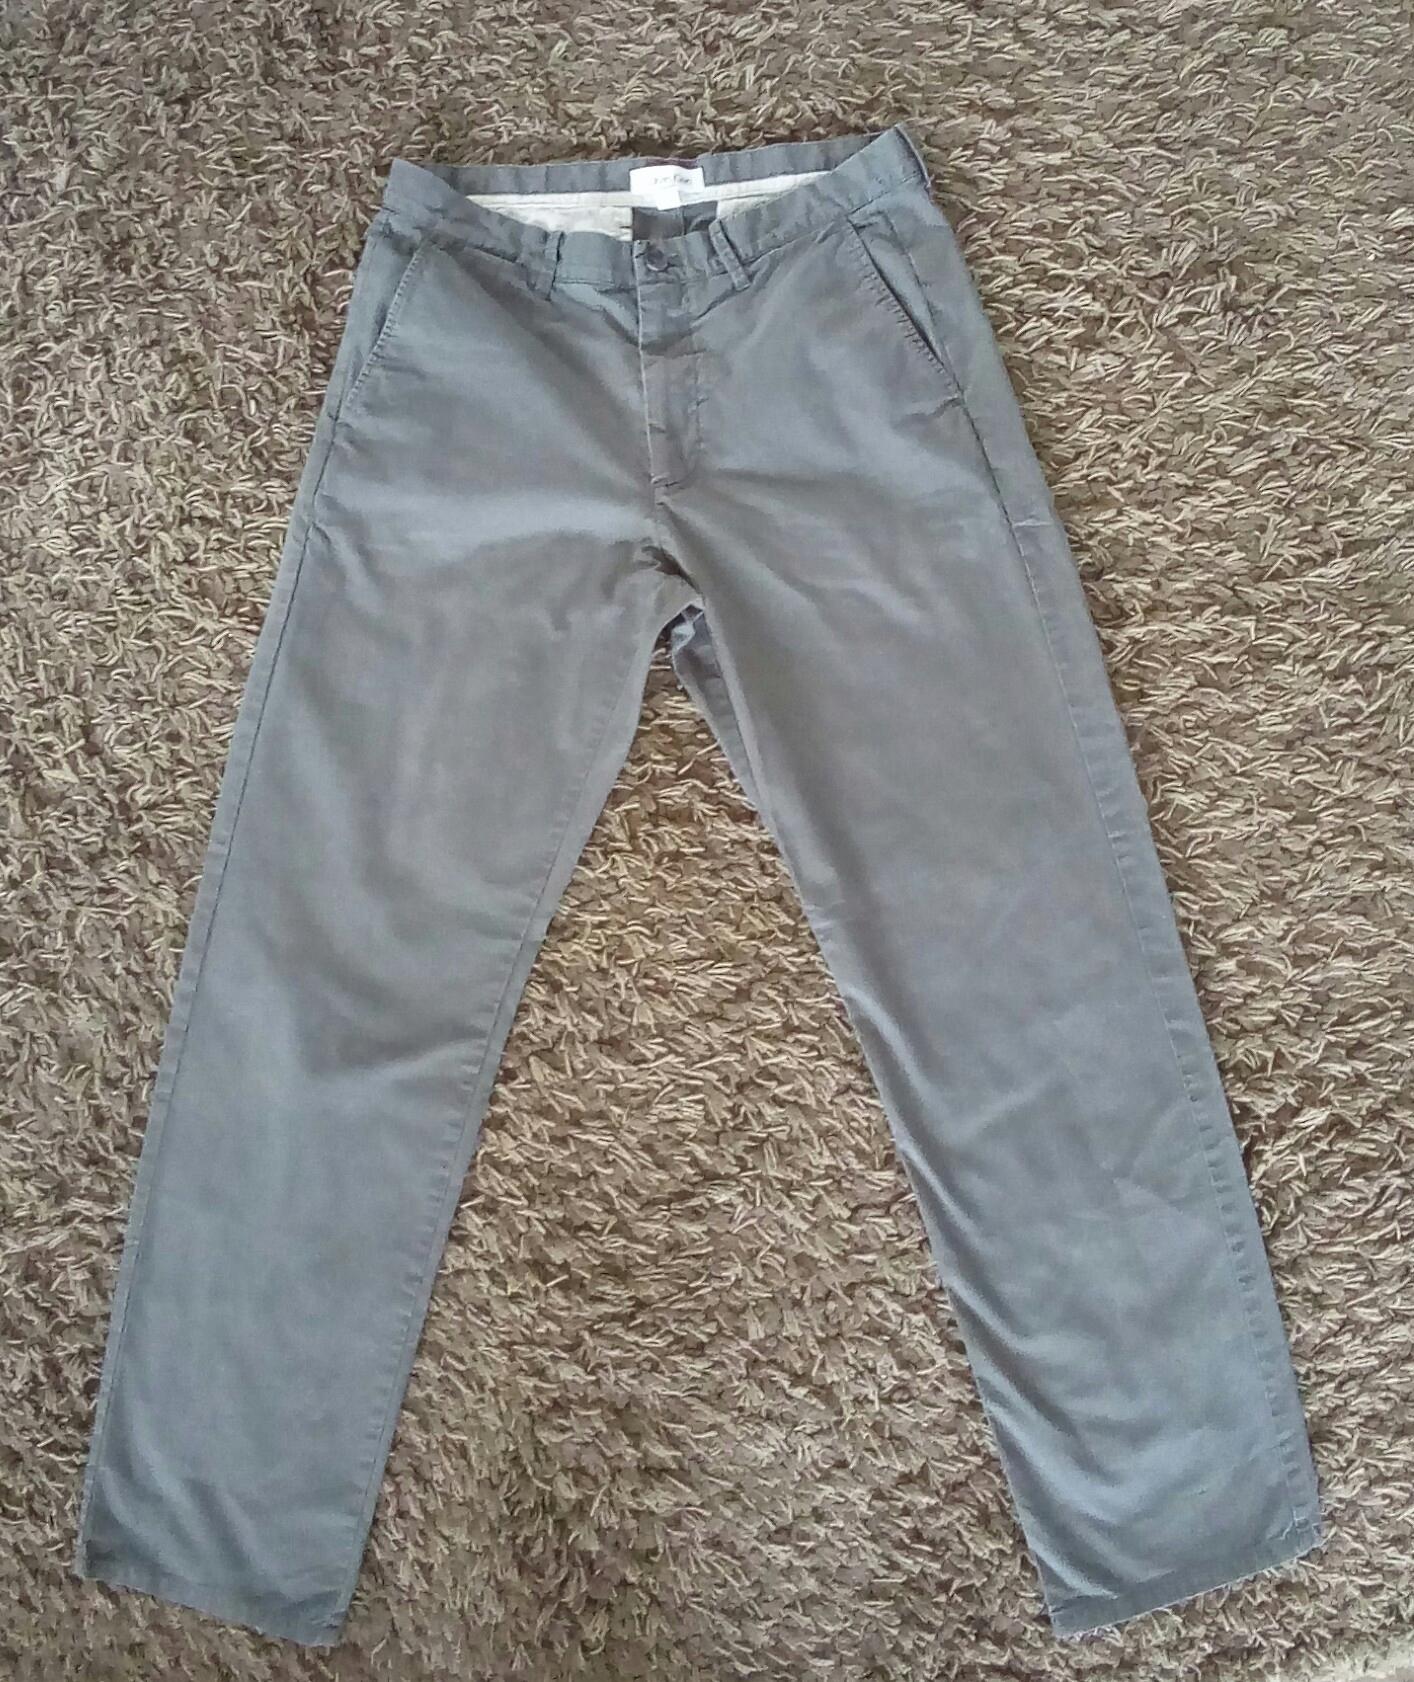 spodnie CK Calvin Klein Casual szare 32 bawełna